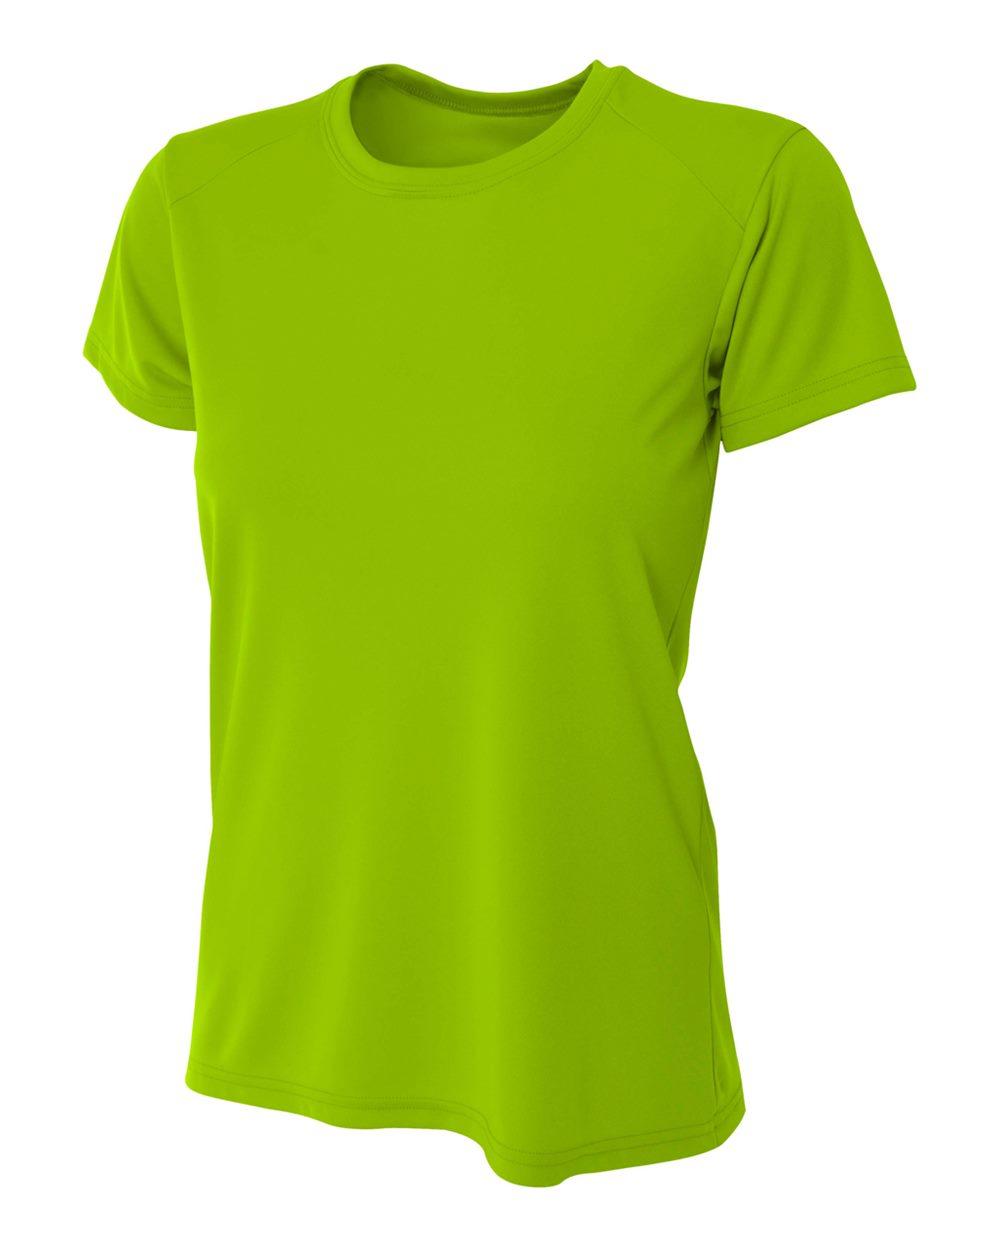 womens-polo-mwicking-lime-green.jpg